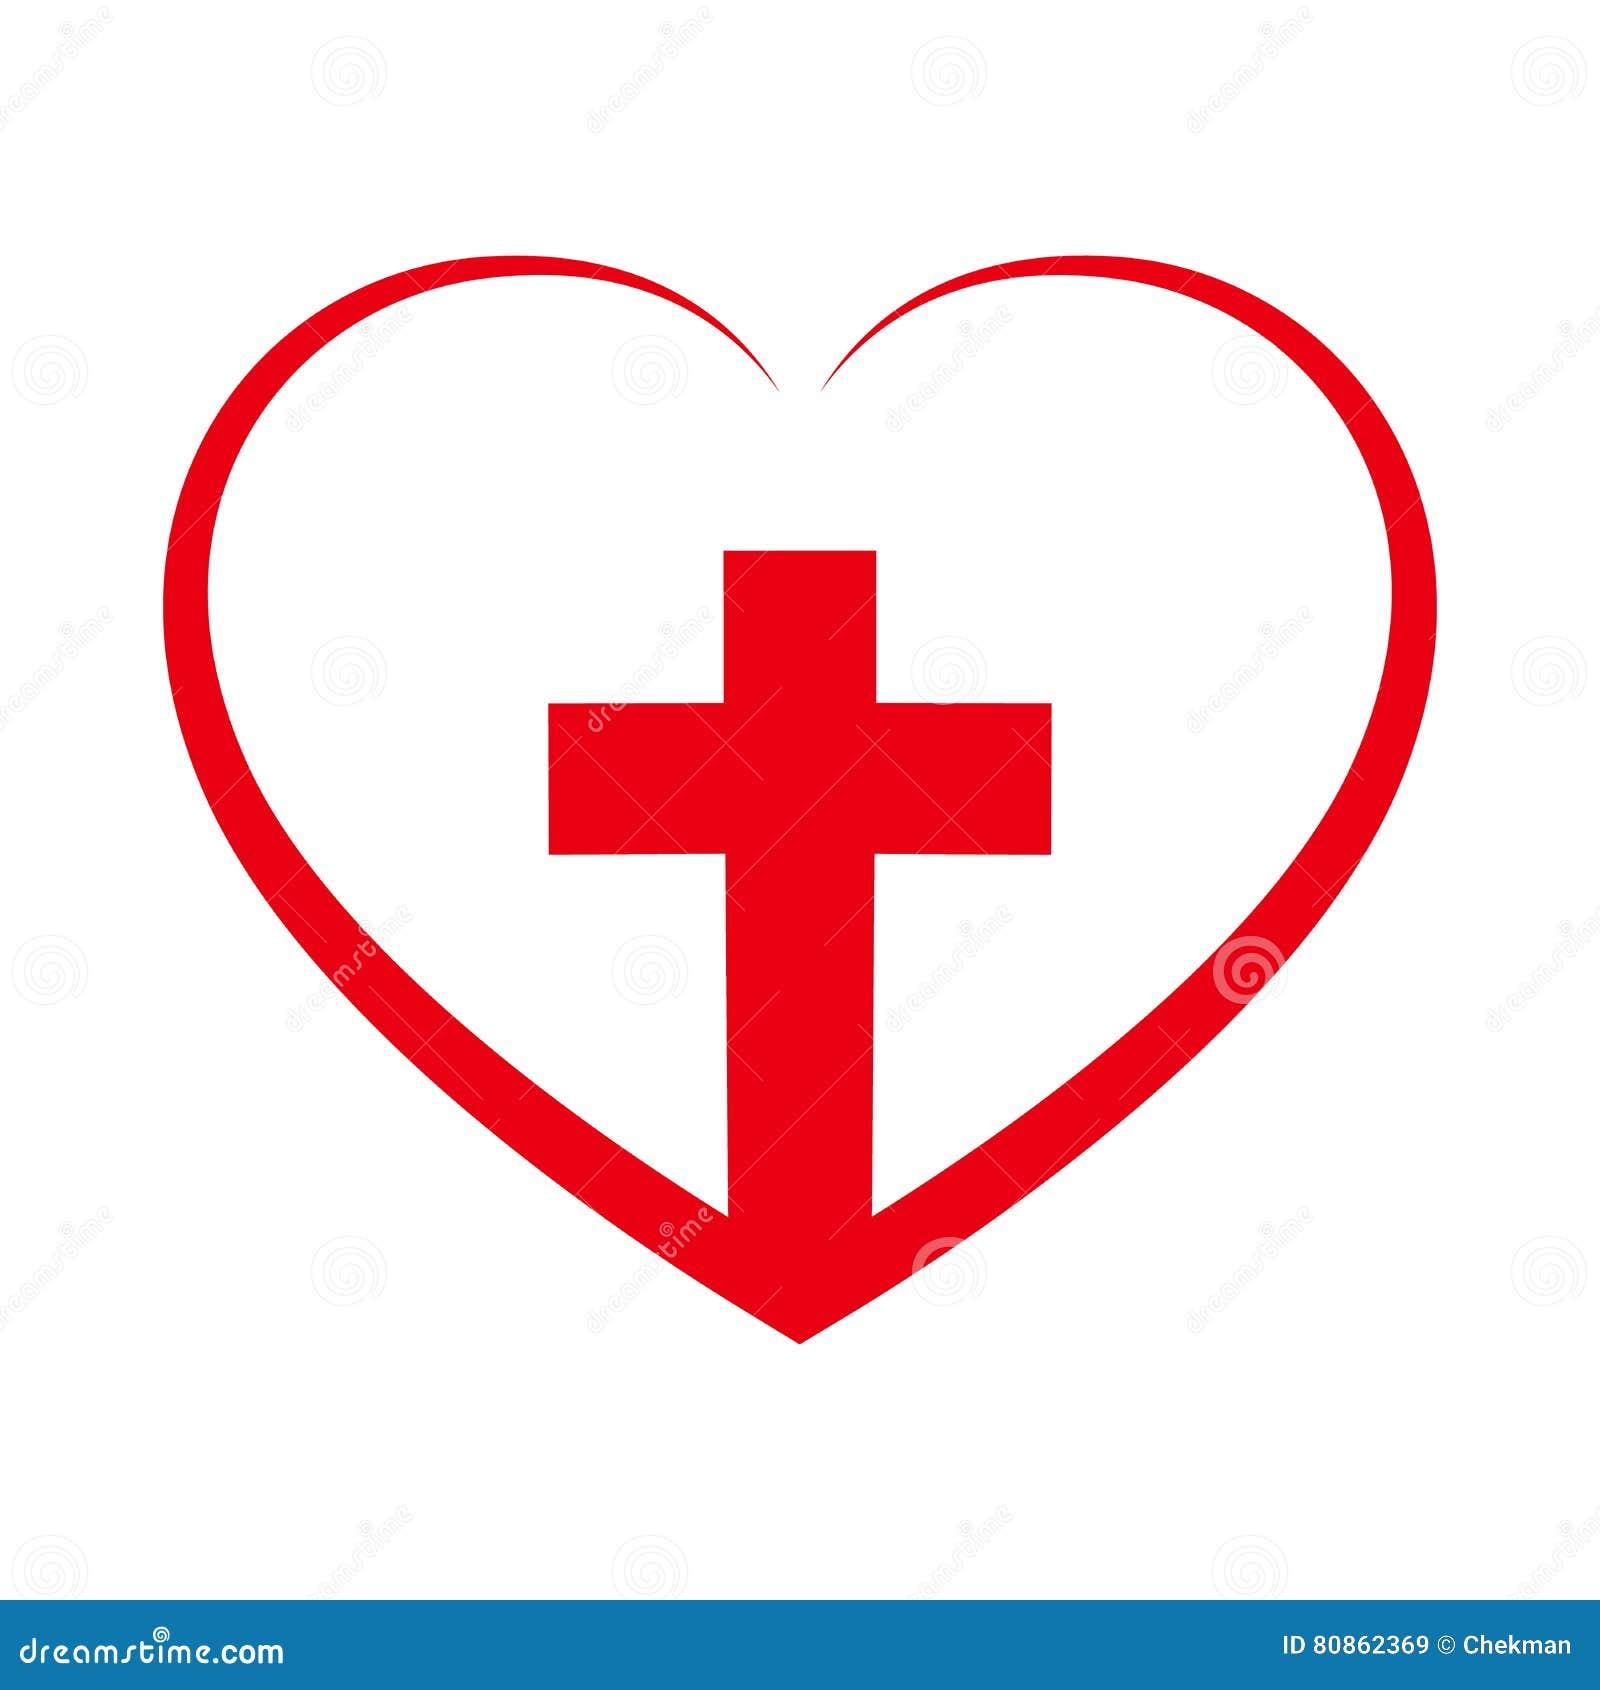 Christian Cross Inside In The Heart. Vector Illustration ... (1300 x 1390 Pixel)